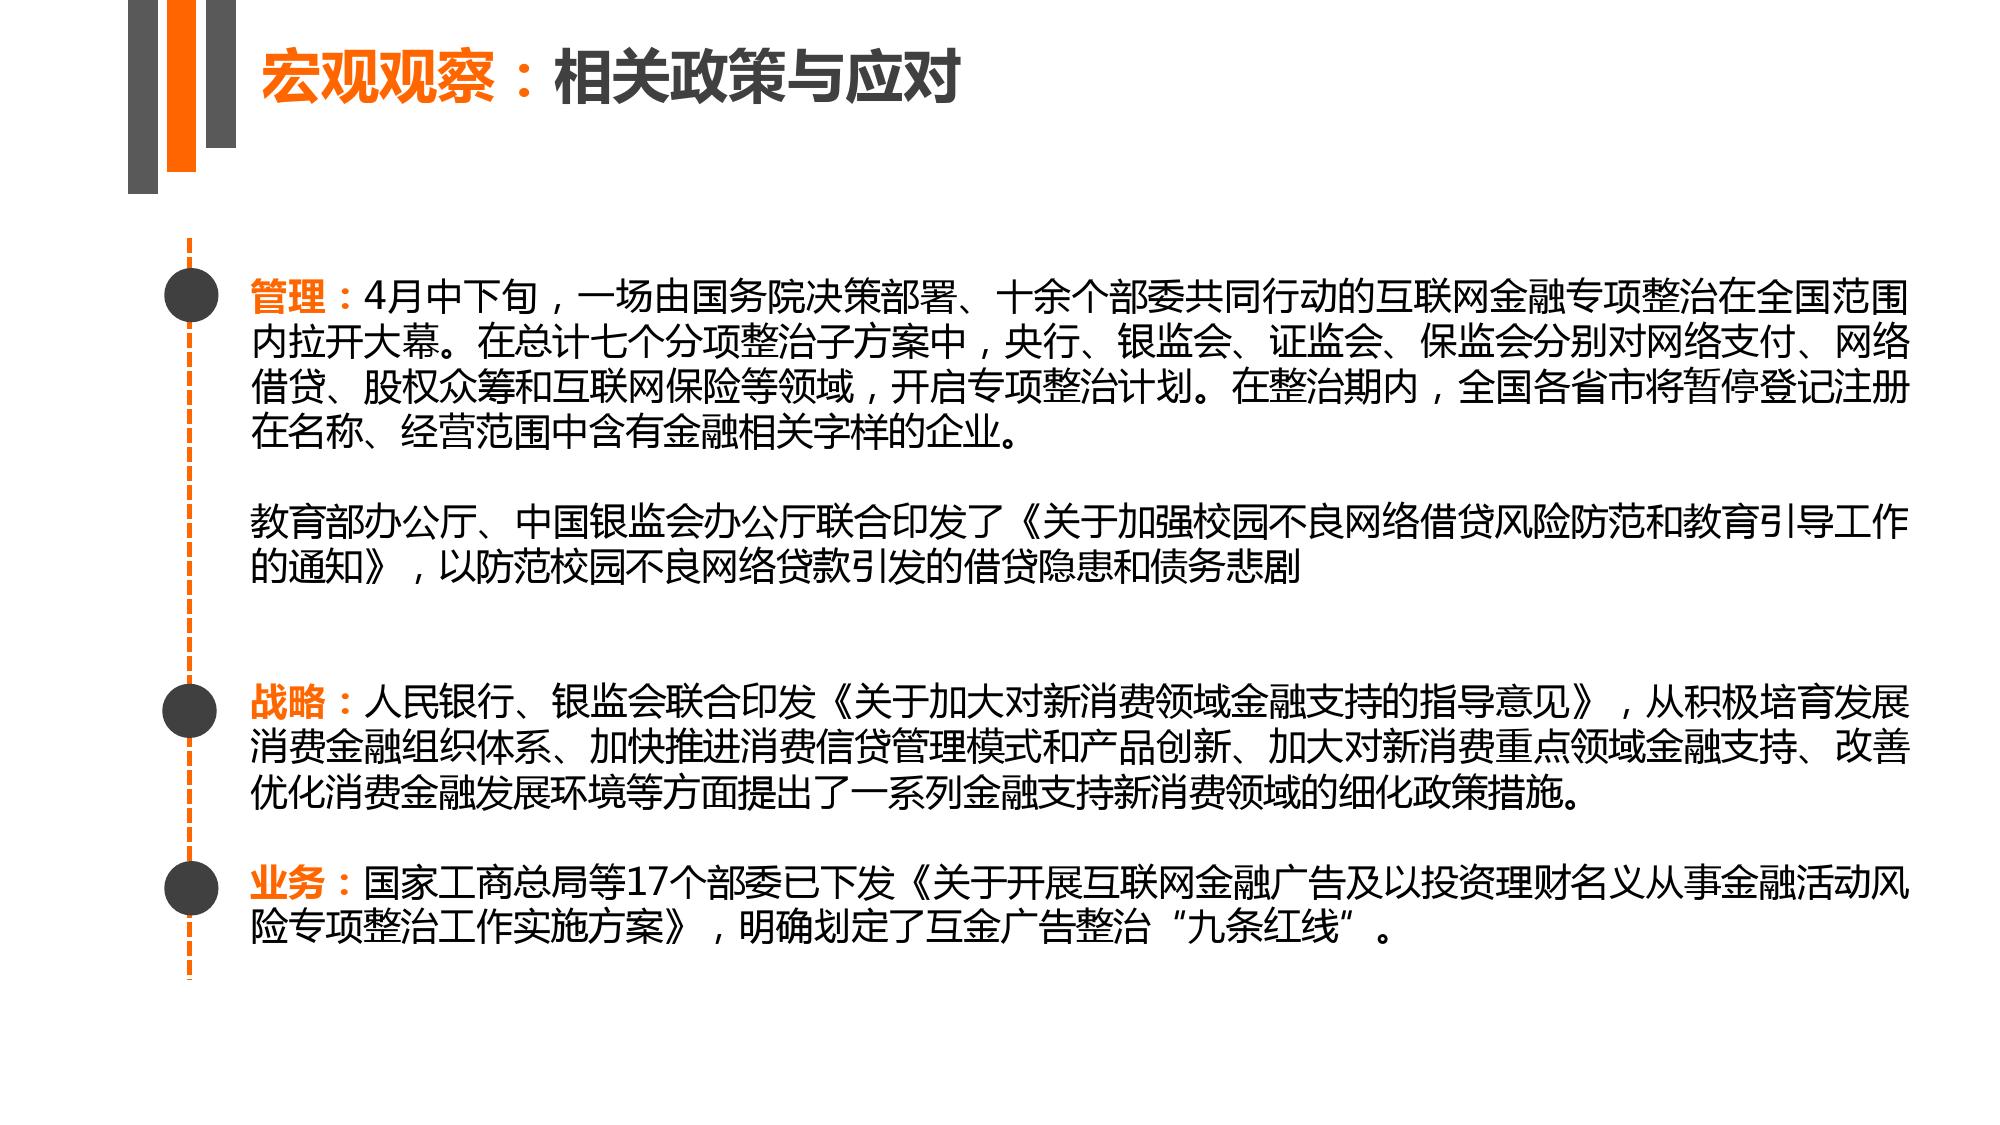 【IT桔子】2016年Q2中国互联网创业投资分析报告_000035